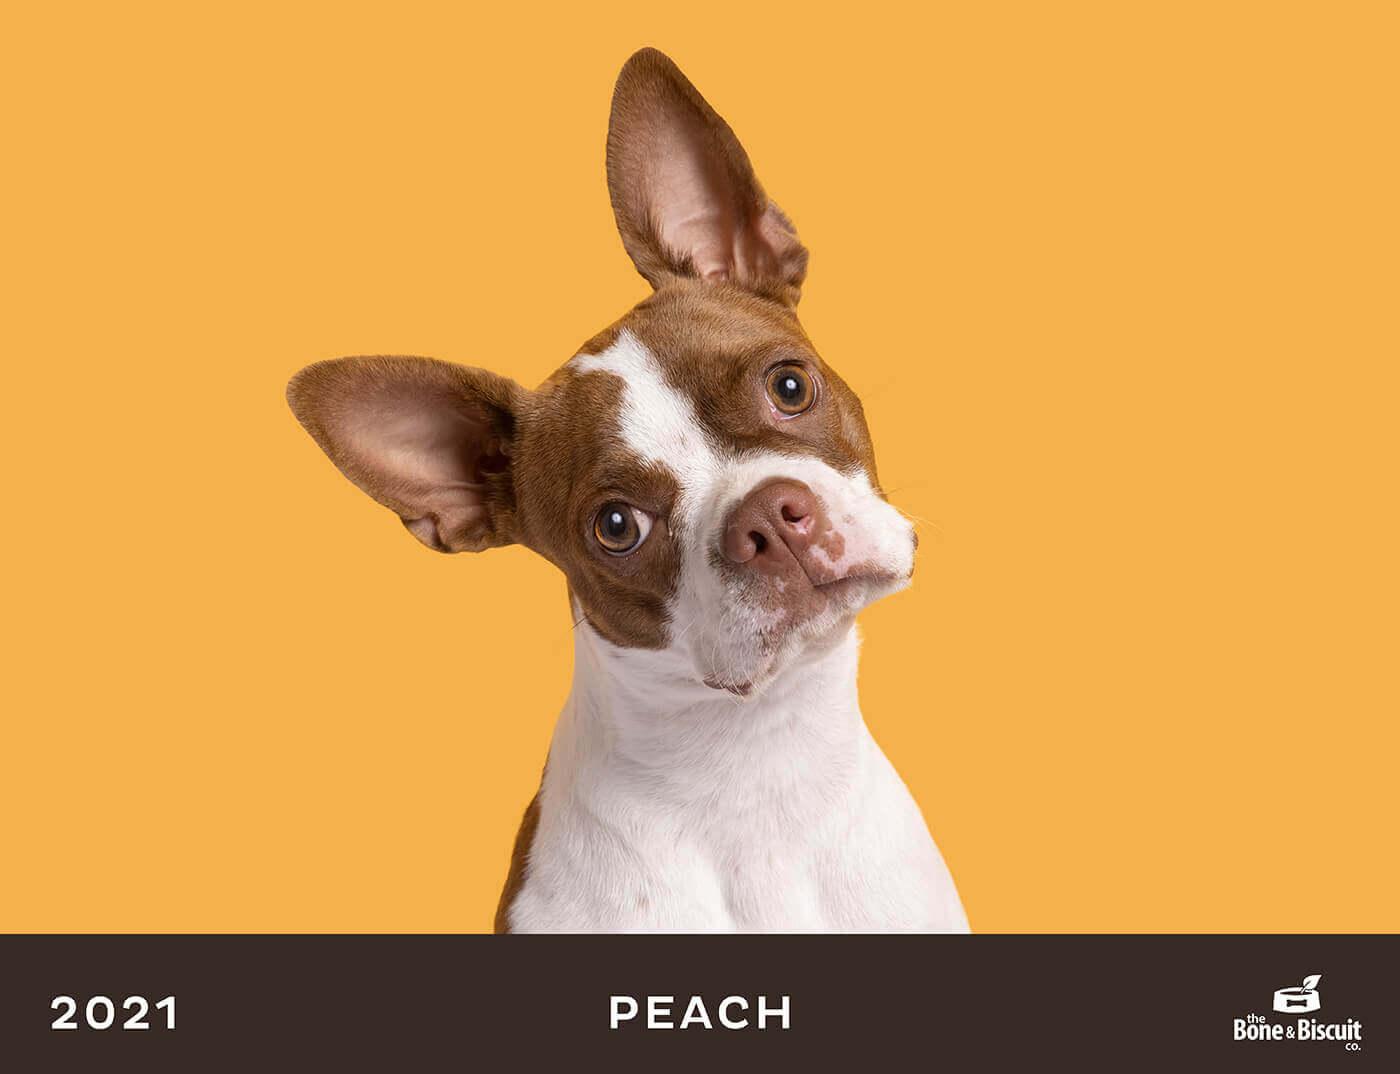 boston dog with headtilt